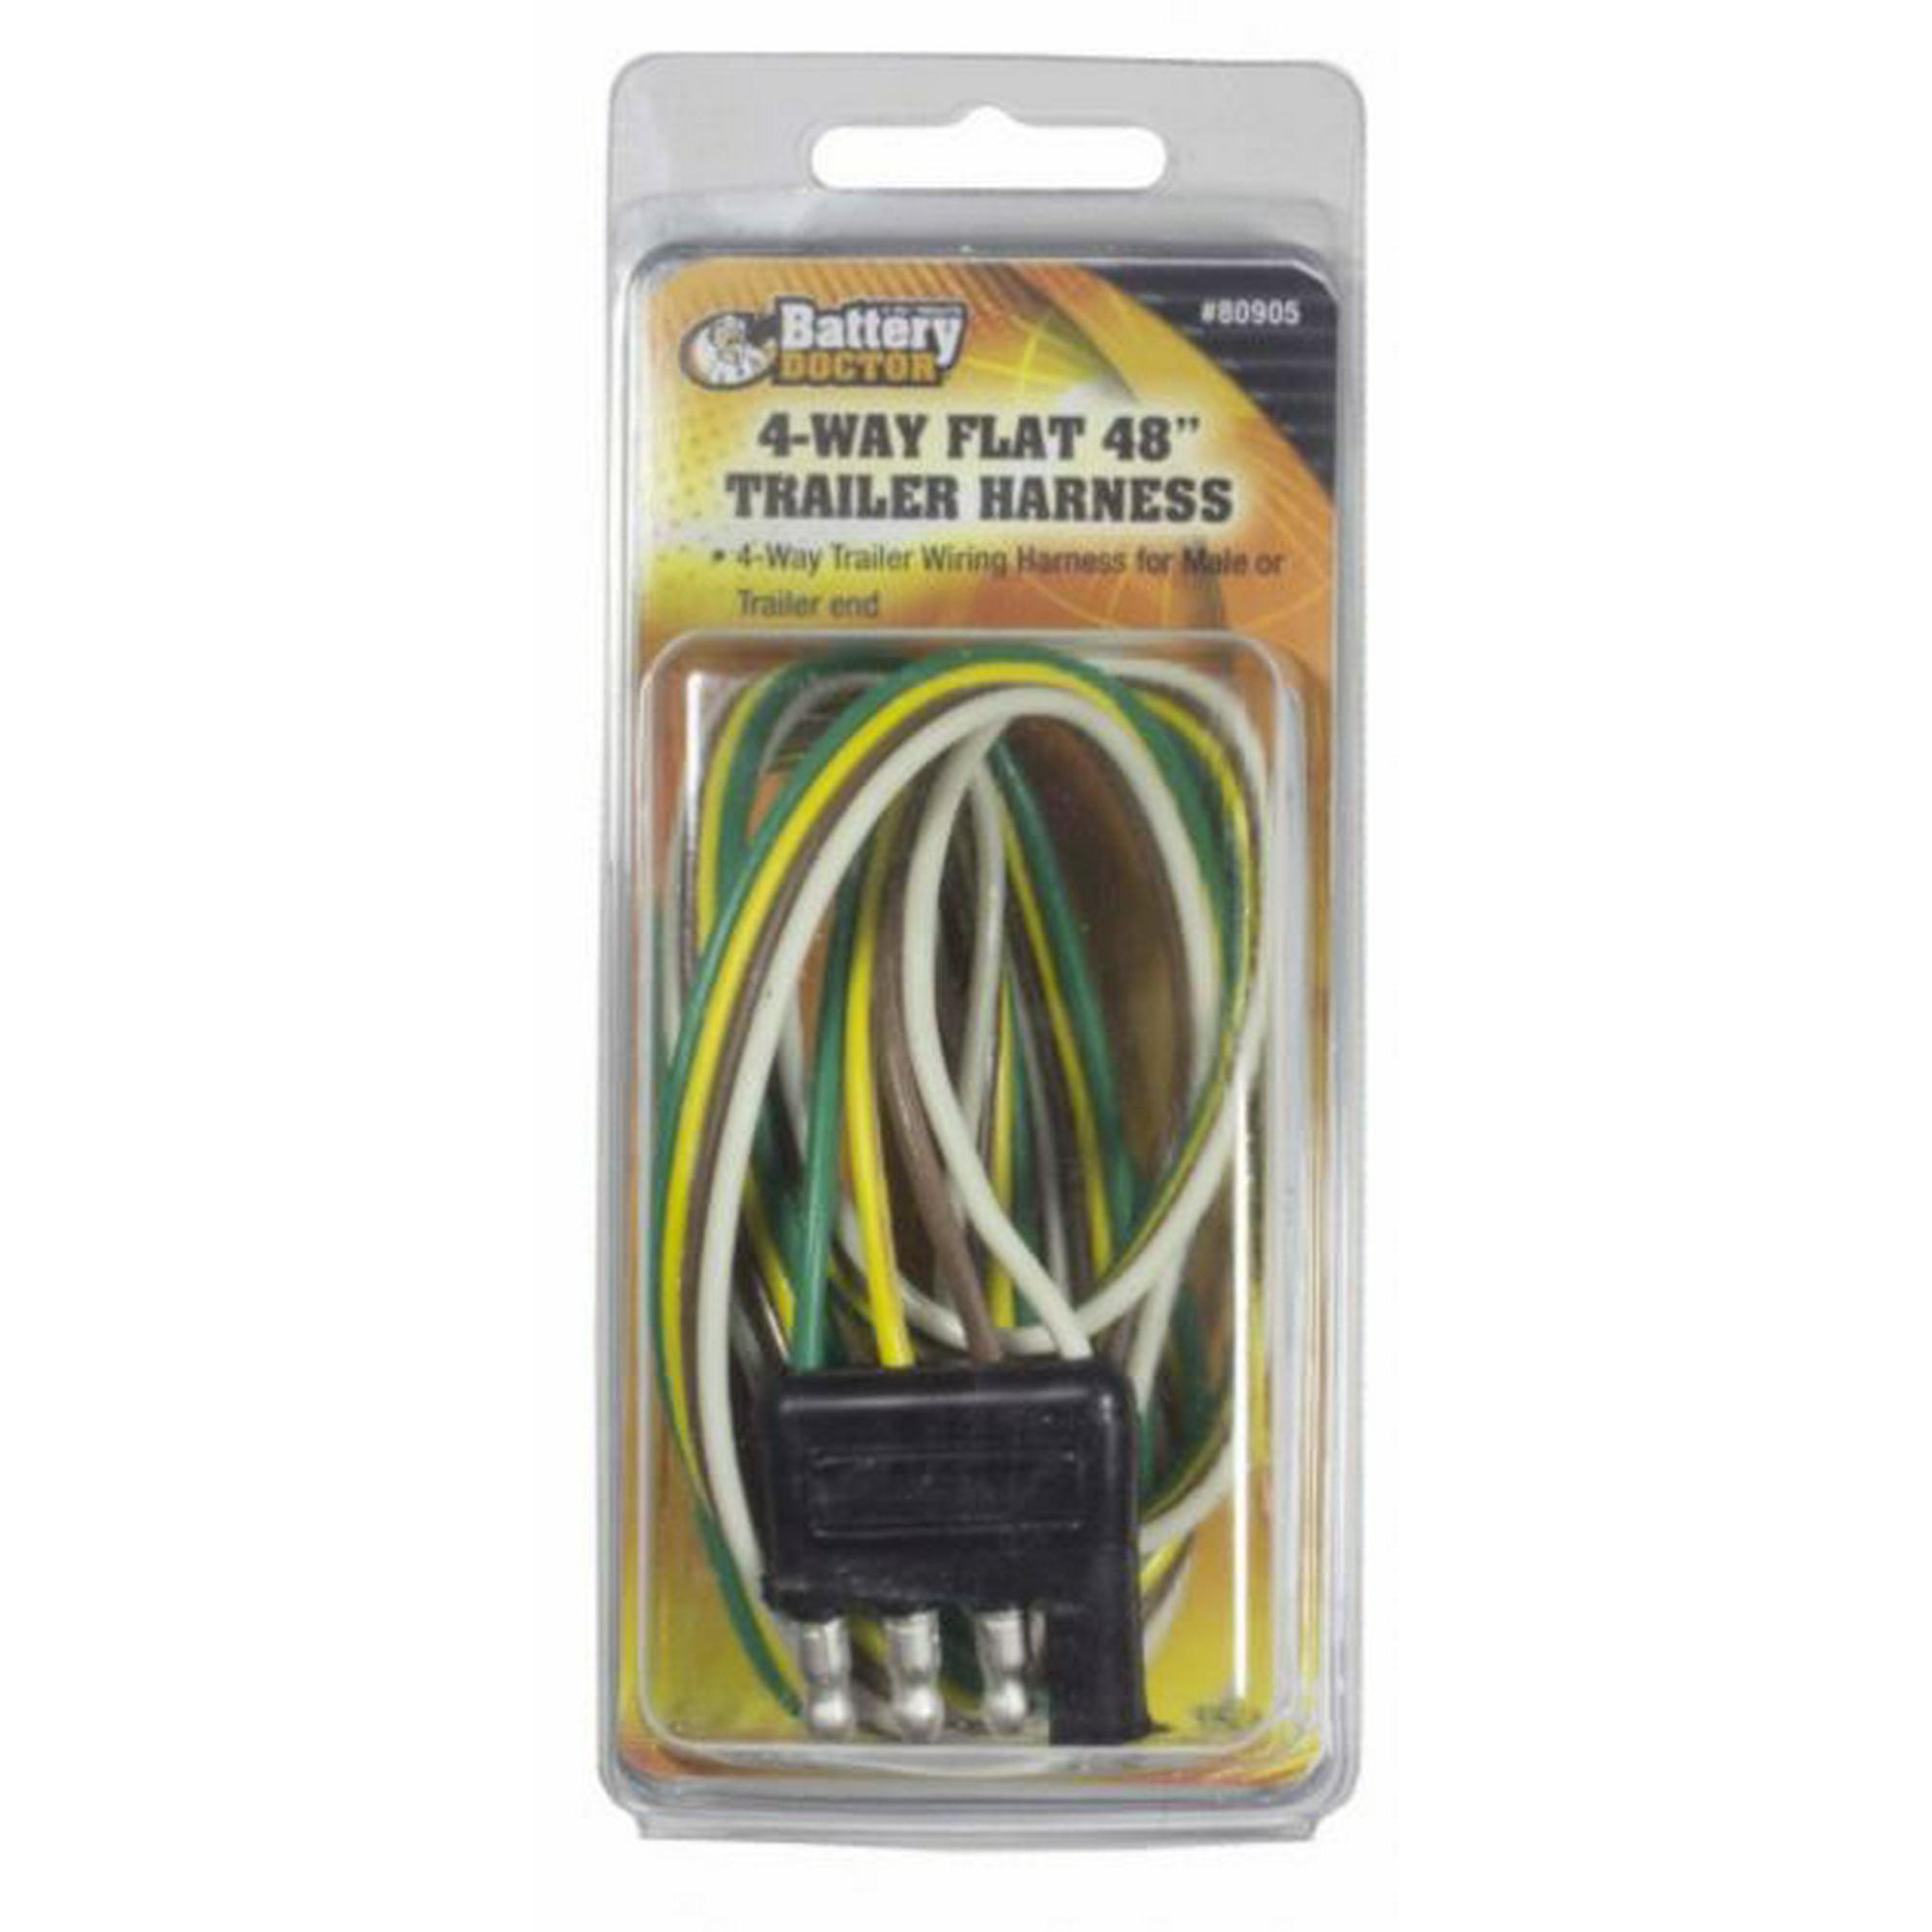 Wirthco 80905 Trailer Wiring Connector Trailer End 4 Way Male Plug 48 Inch Lead Length Walmart Canada